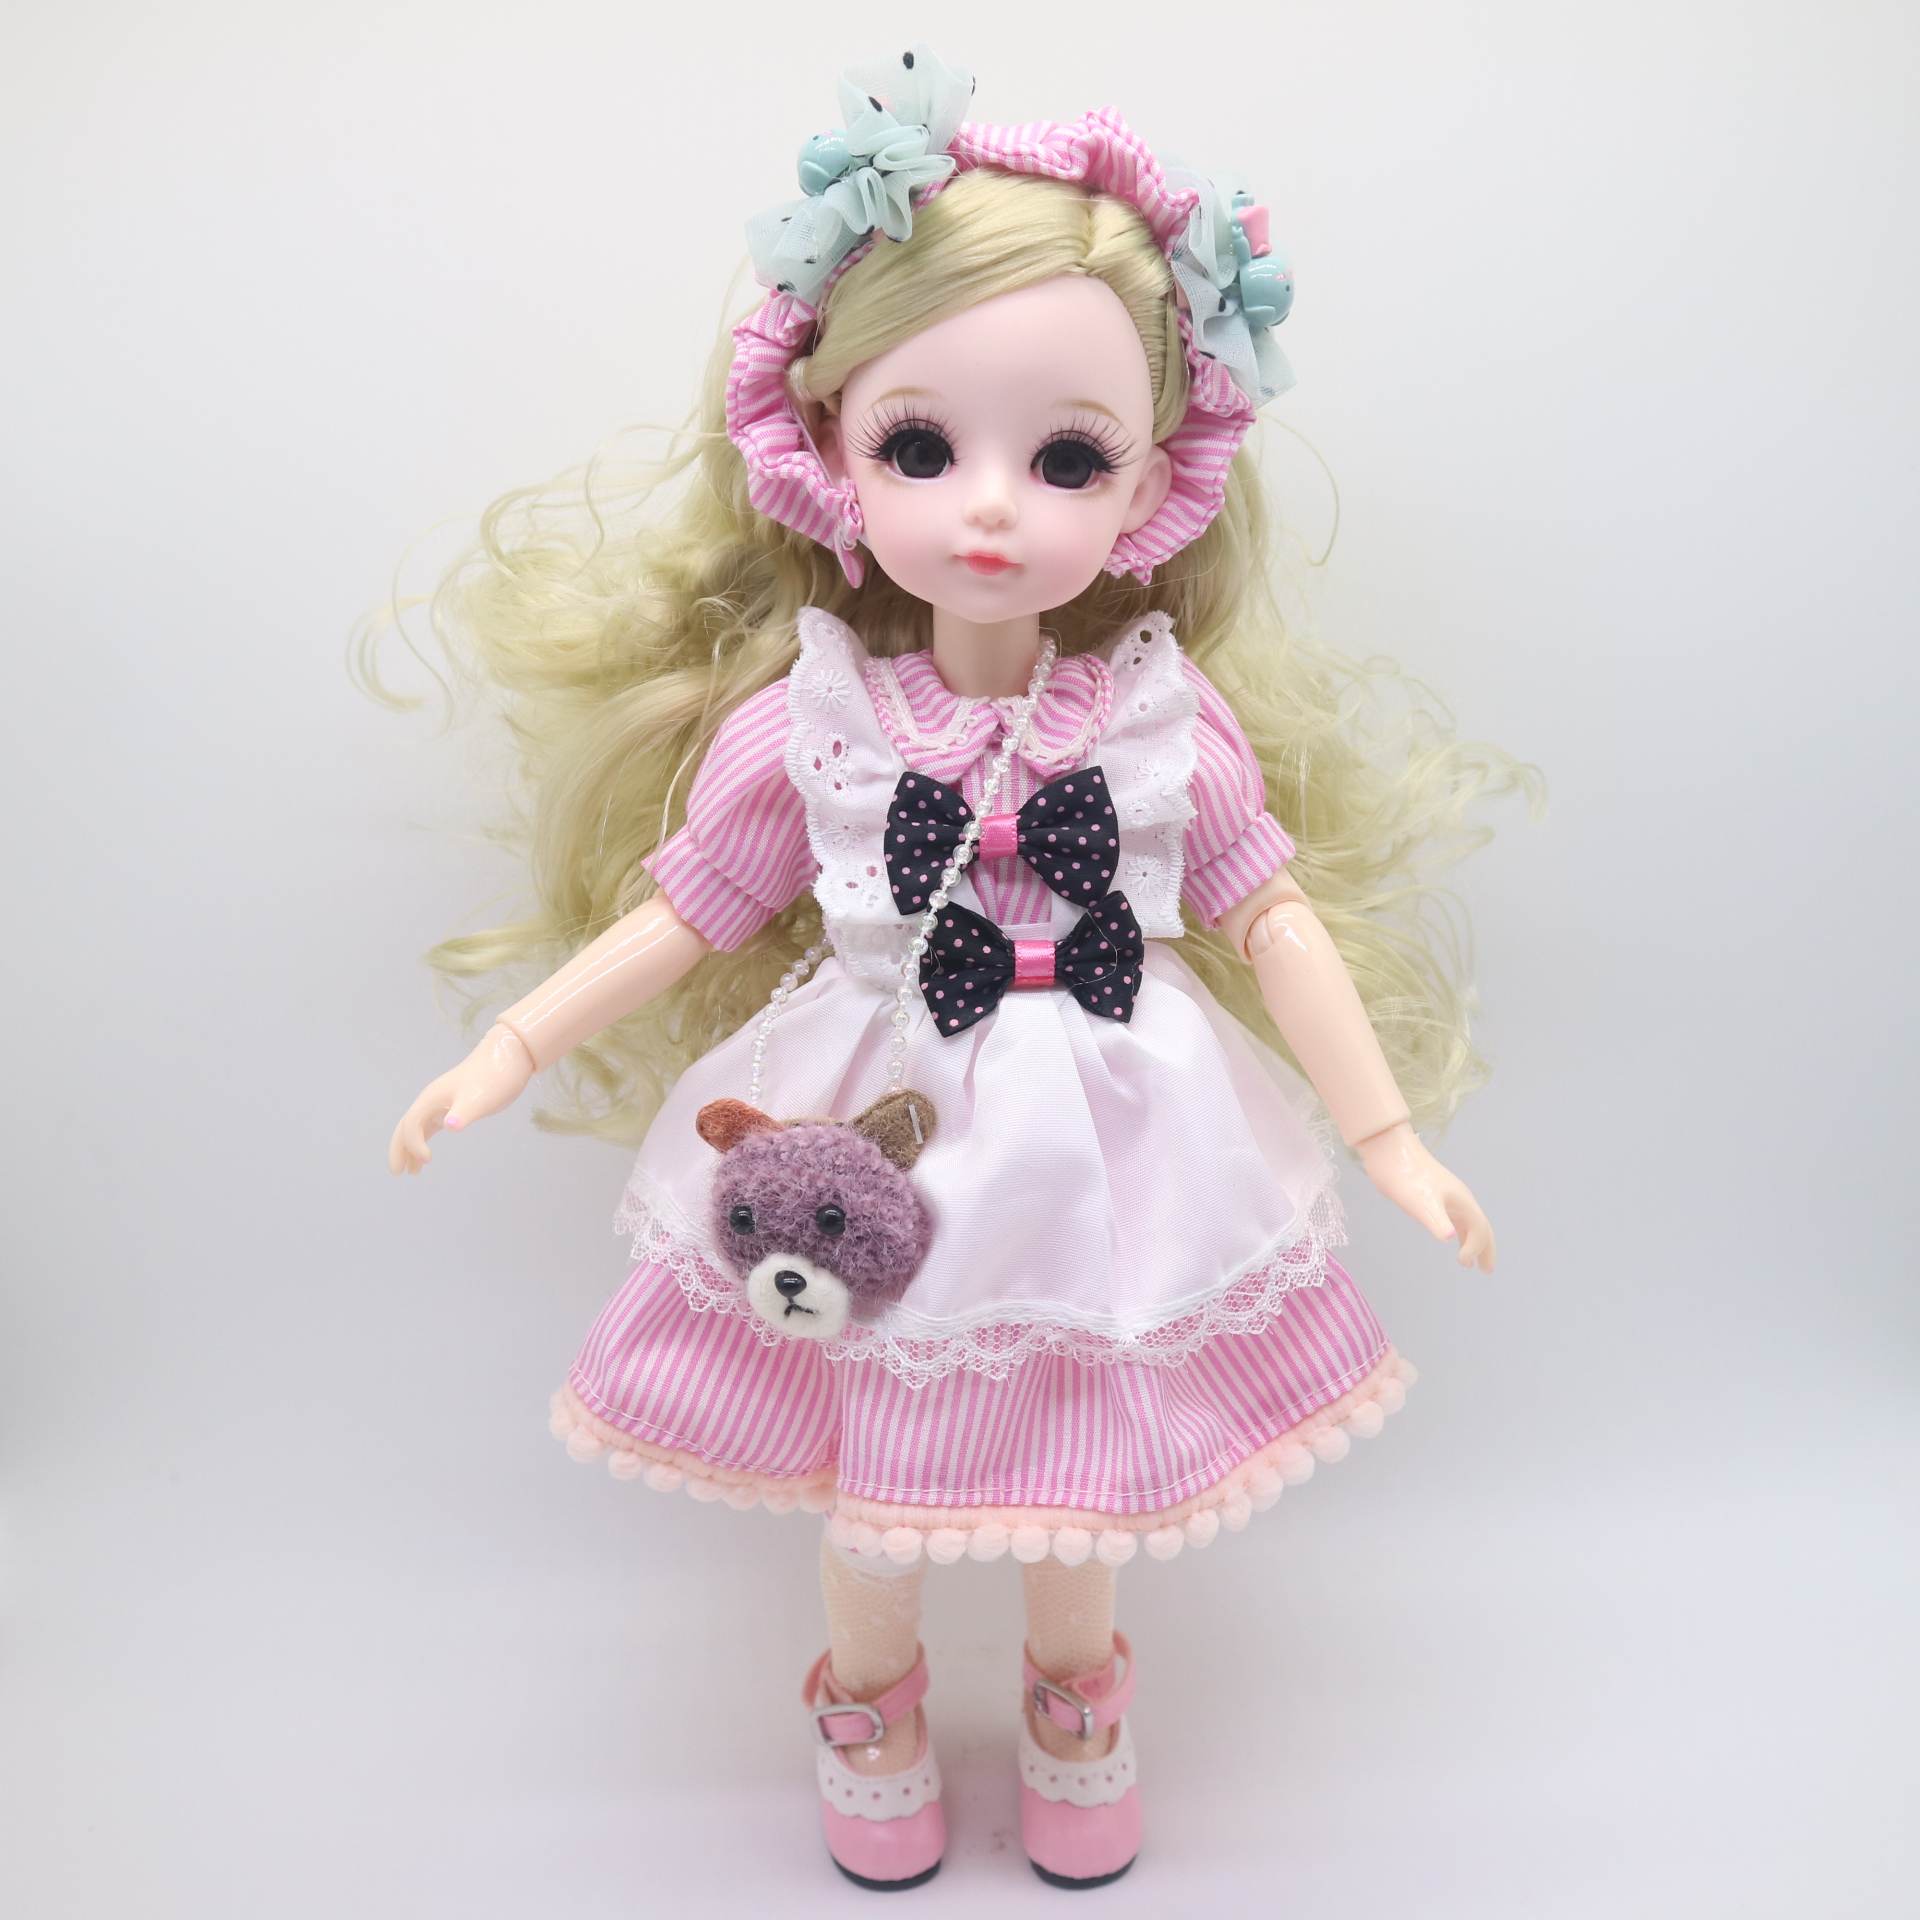 BJD Girl dolls 30 CM plastic doll selling with dress,wigs